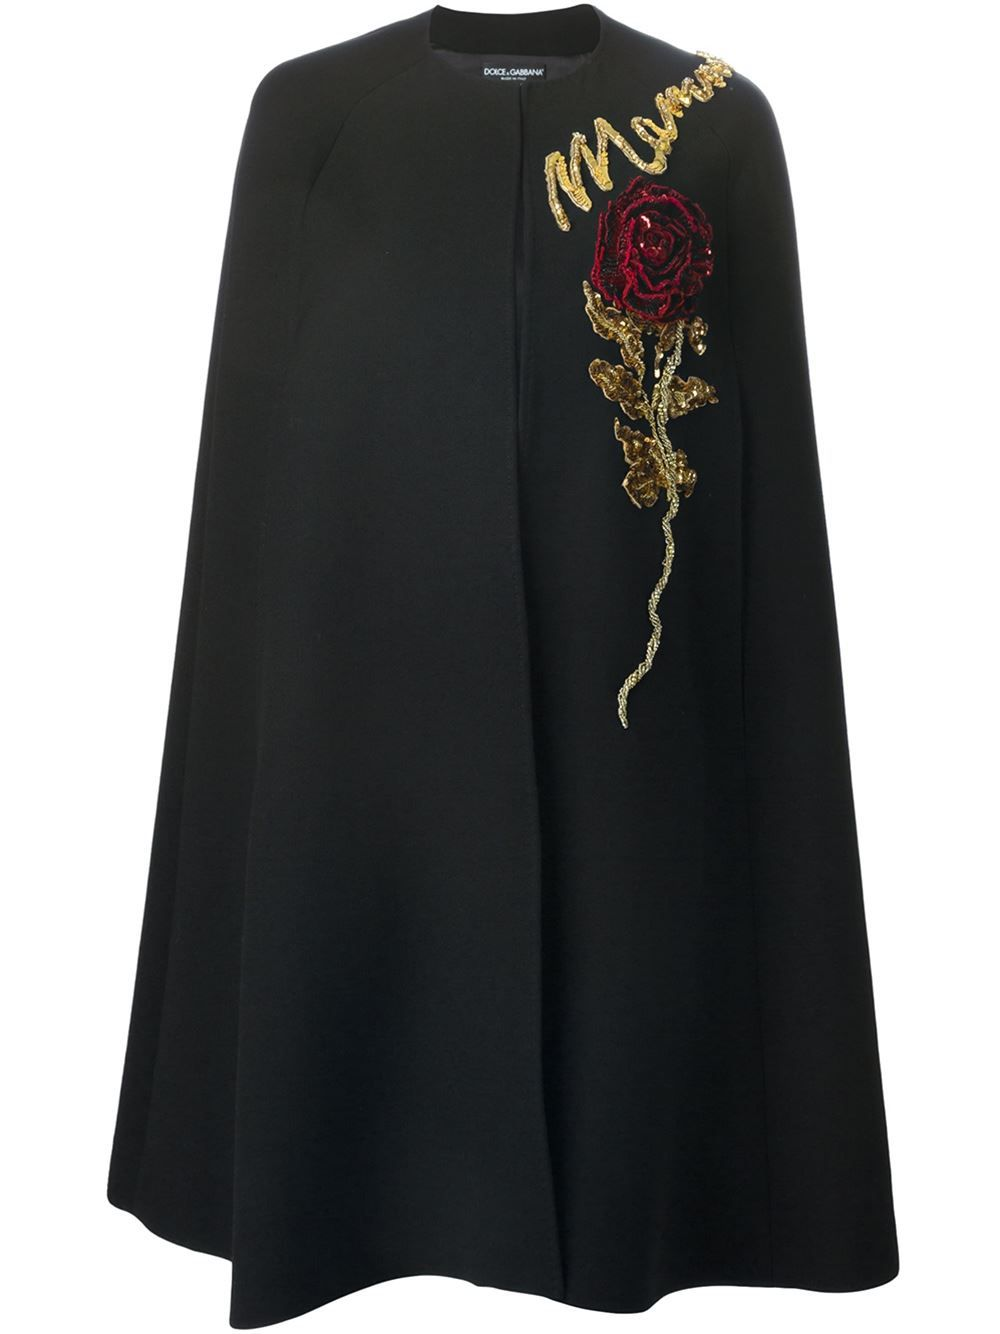 733ef6add08 Dolce   Gabbana Rose Appliqué Cape - Torregrossa - Farfetch.com ...